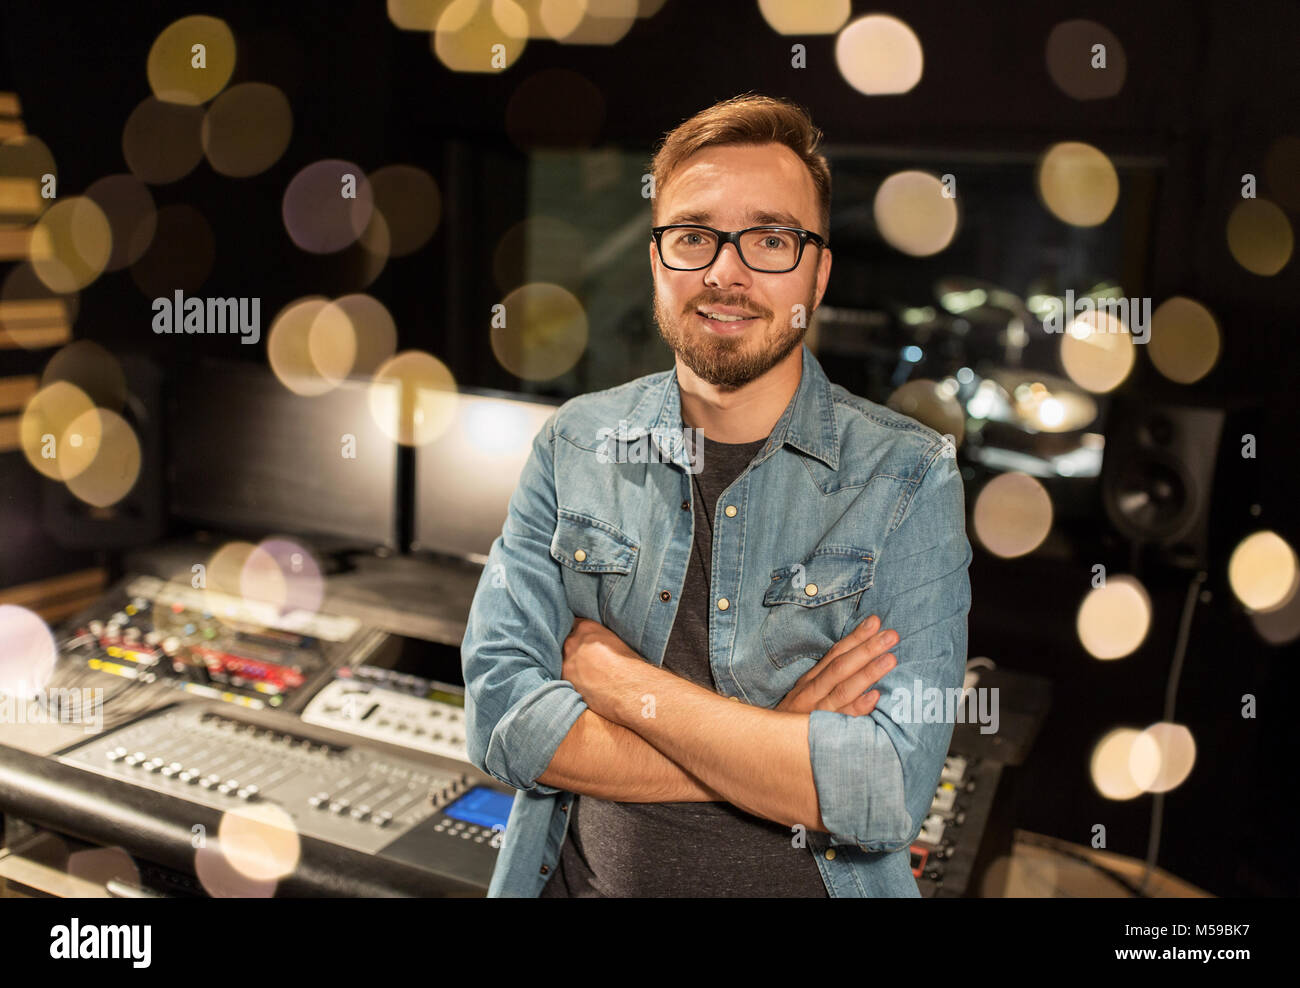 Mann am Mischpult in Musik-Tonstudio Stockbild